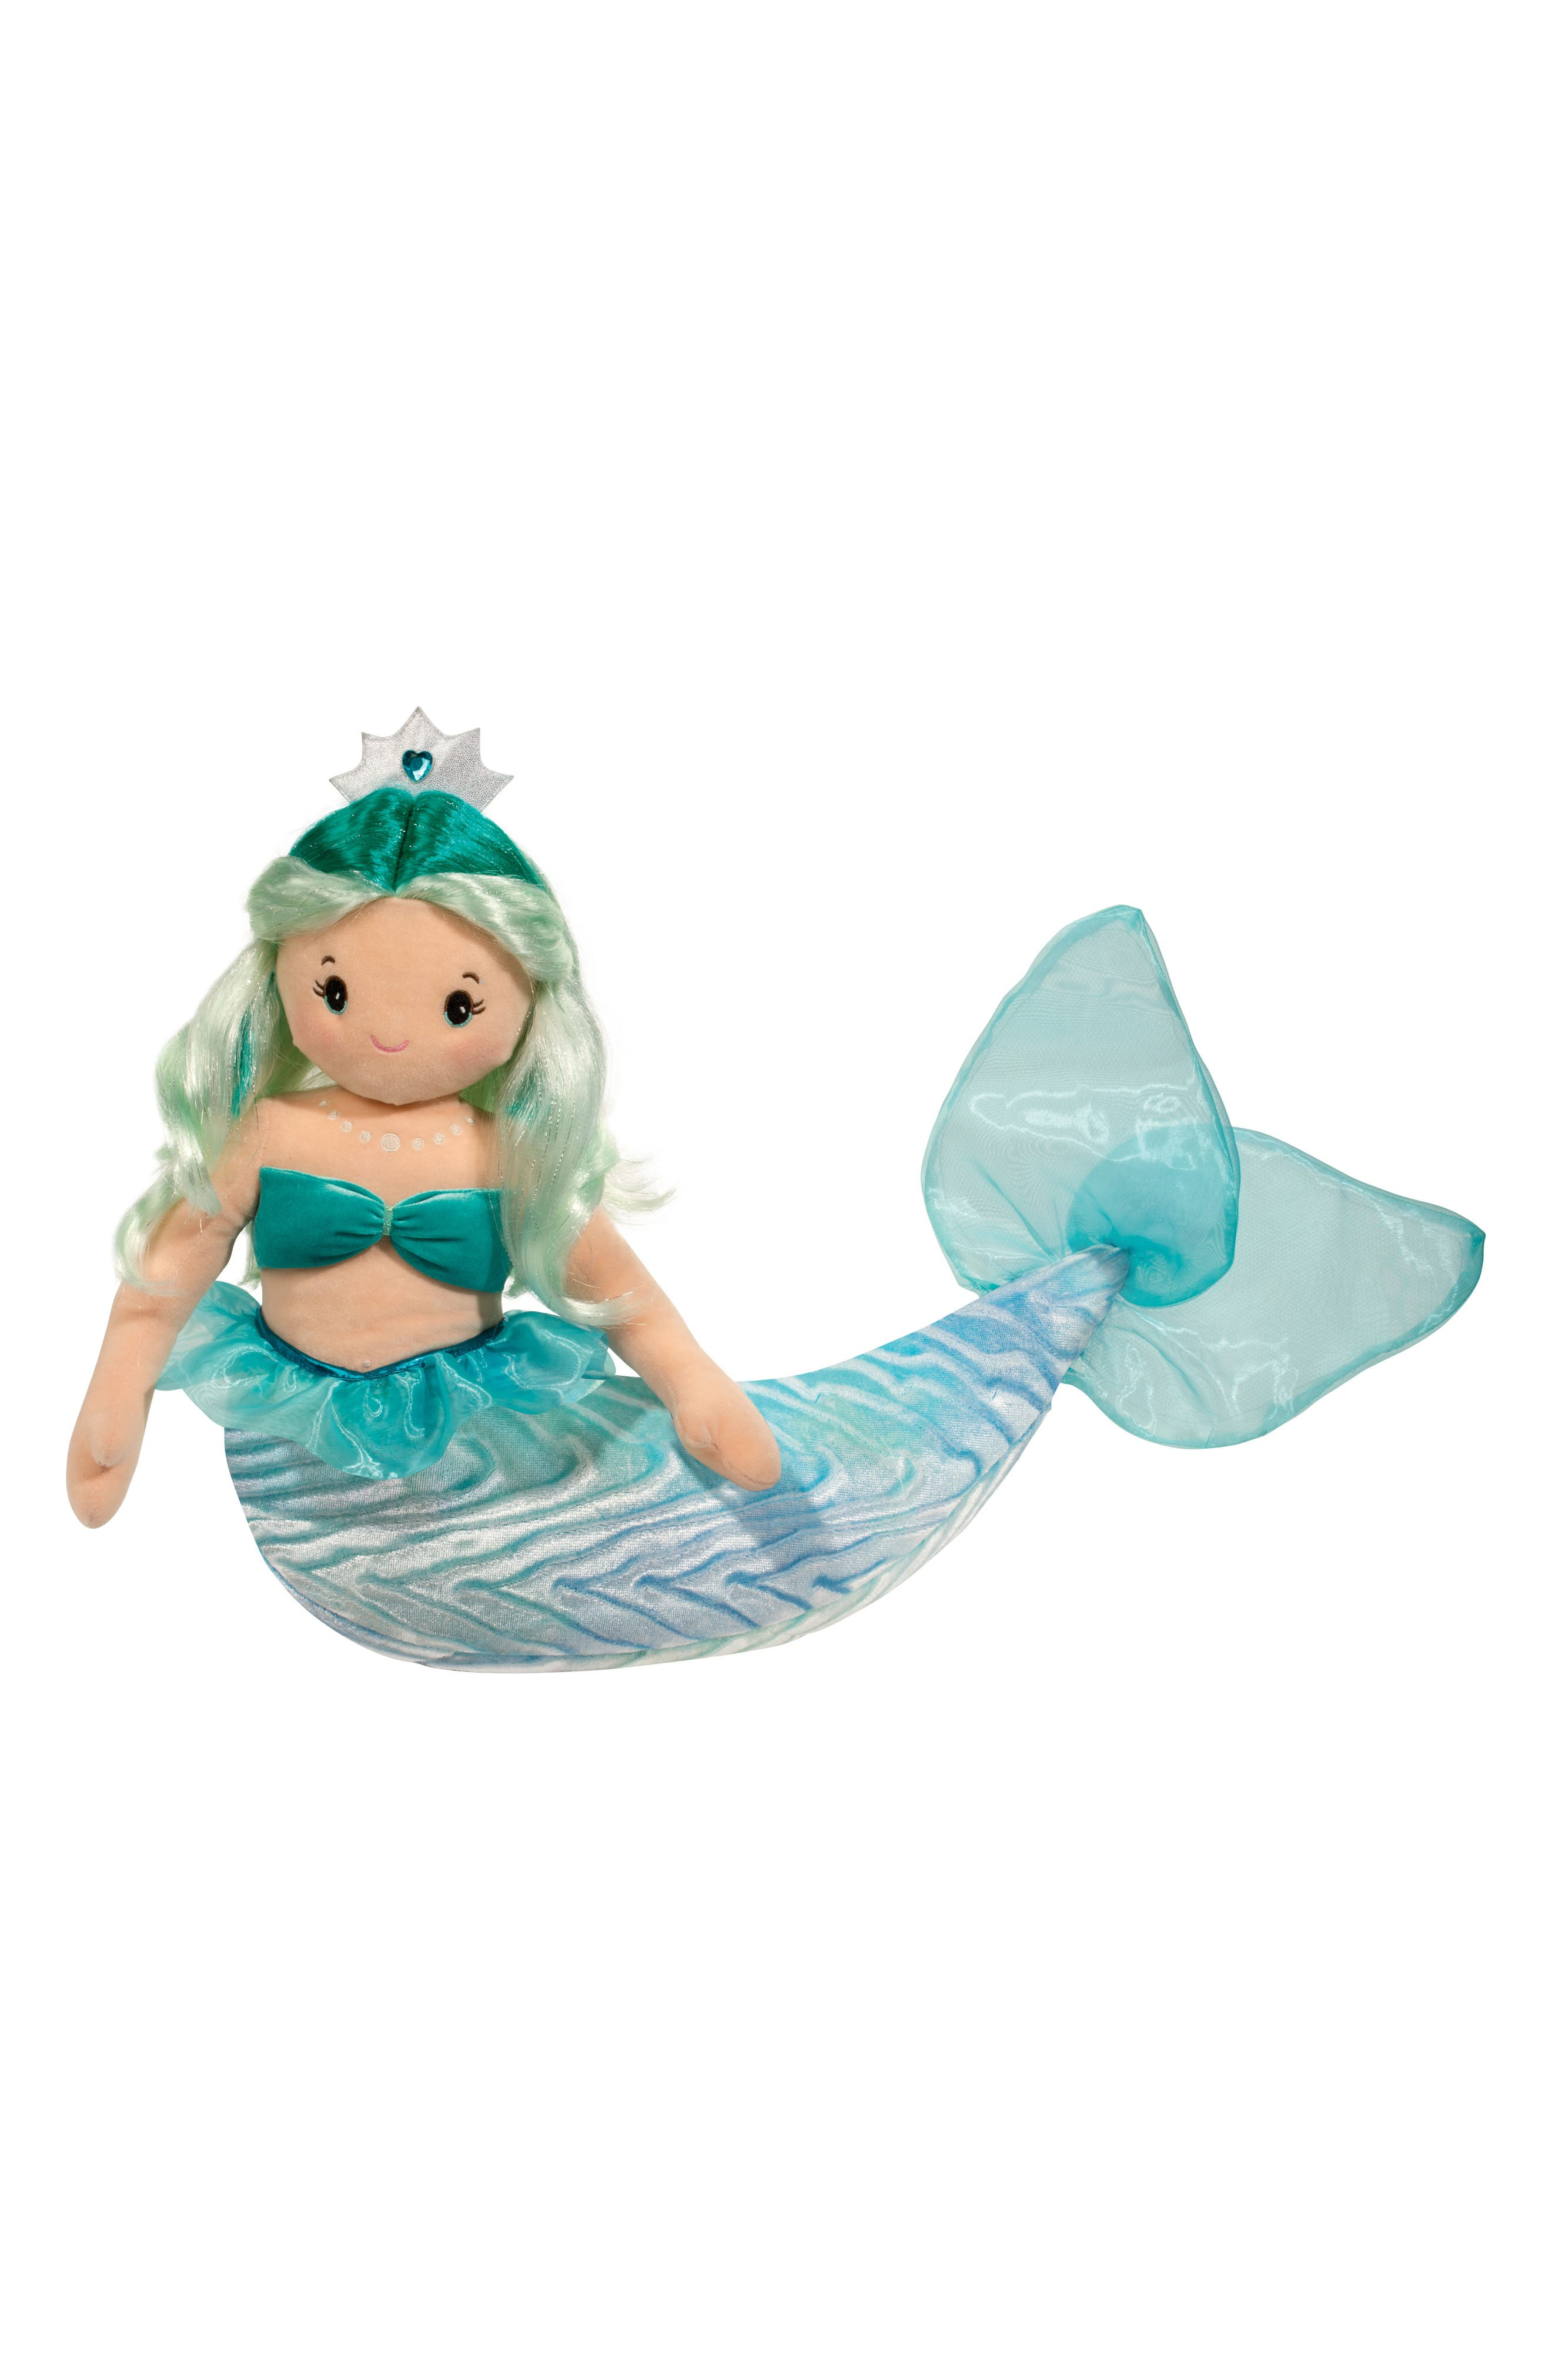 Ciara - Extra Large Aqua Mermaid Doll,                             Main thumbnail 1, color,                             Aqua